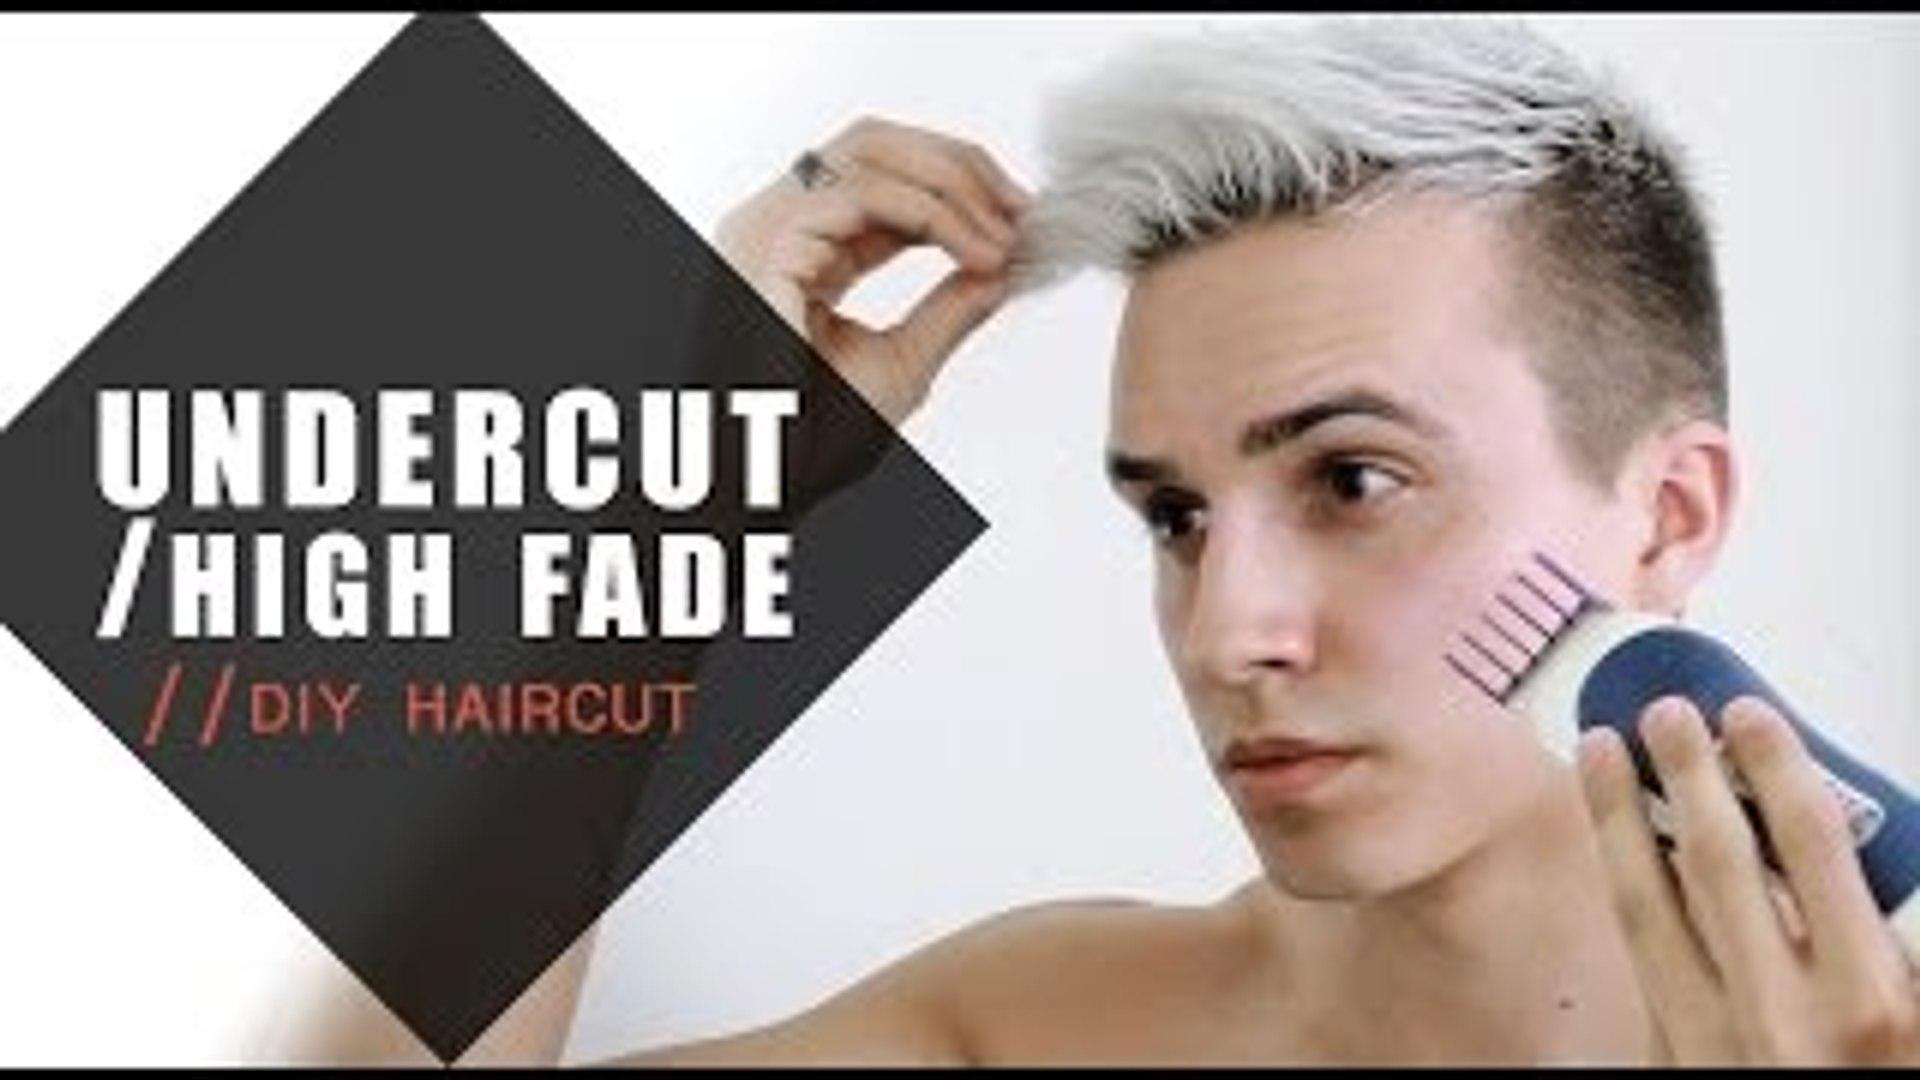 Undercut/High Fade - How I cut my hair - Mens Hairstyles